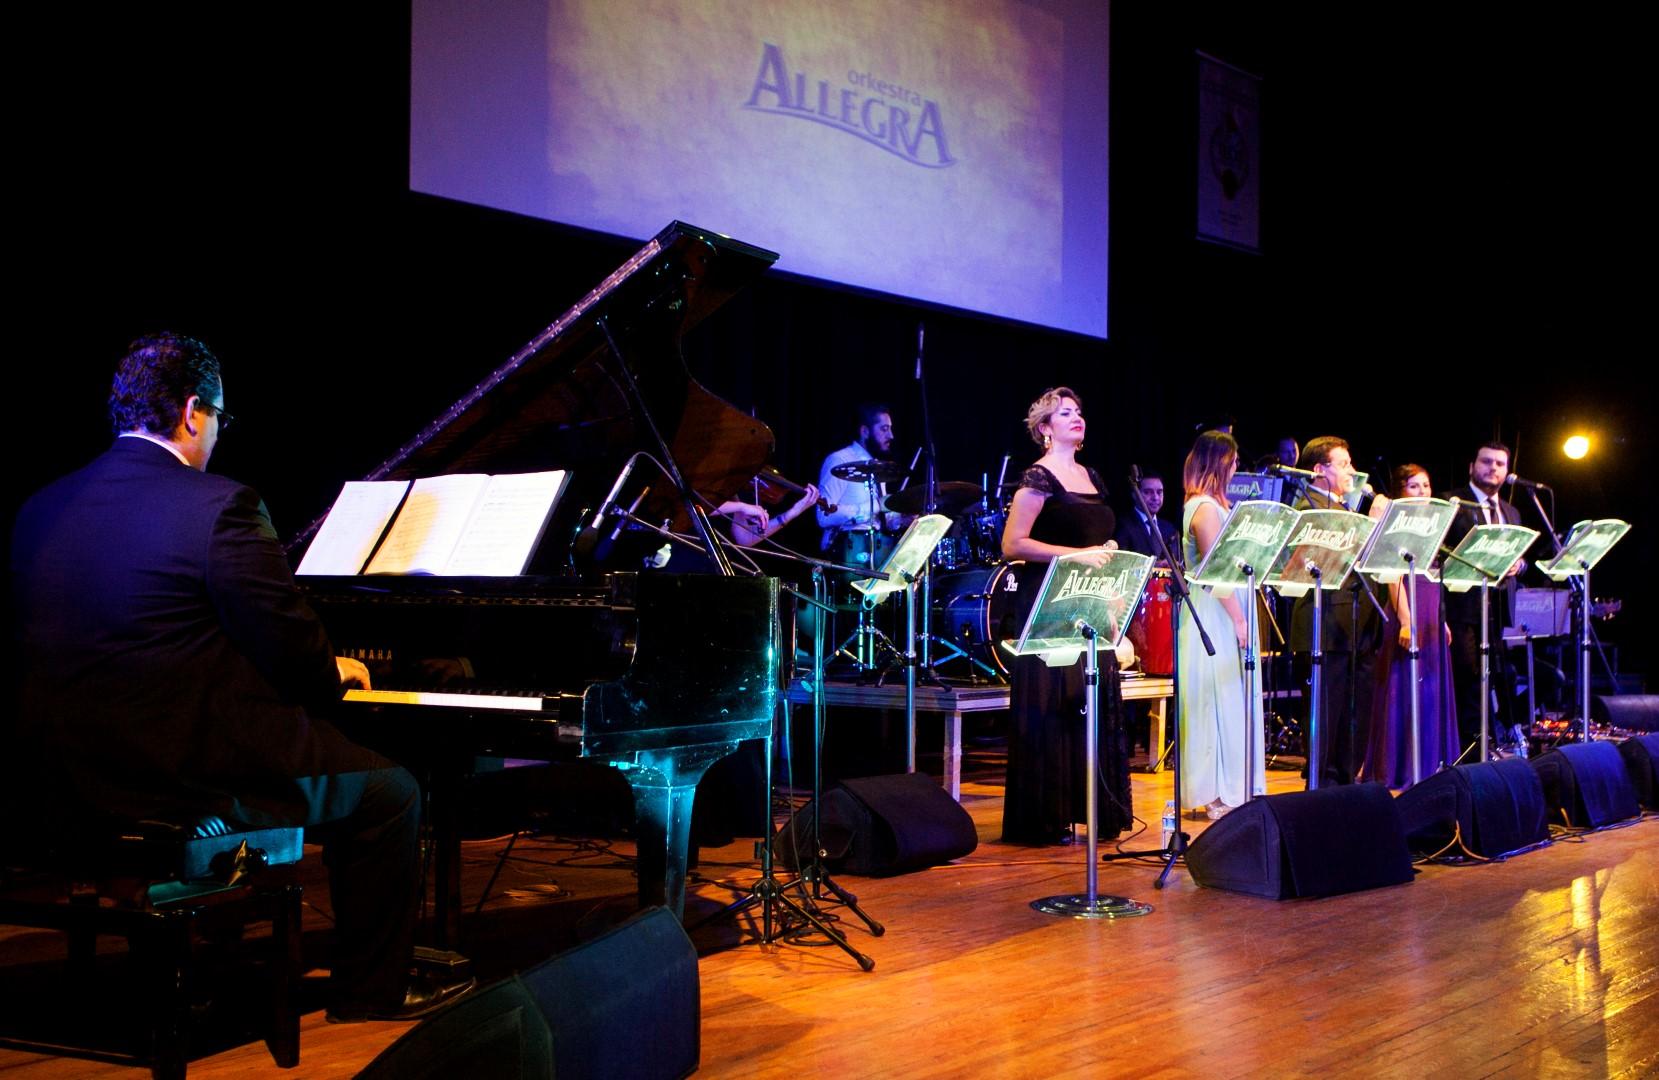 orkestra-allegra (8)